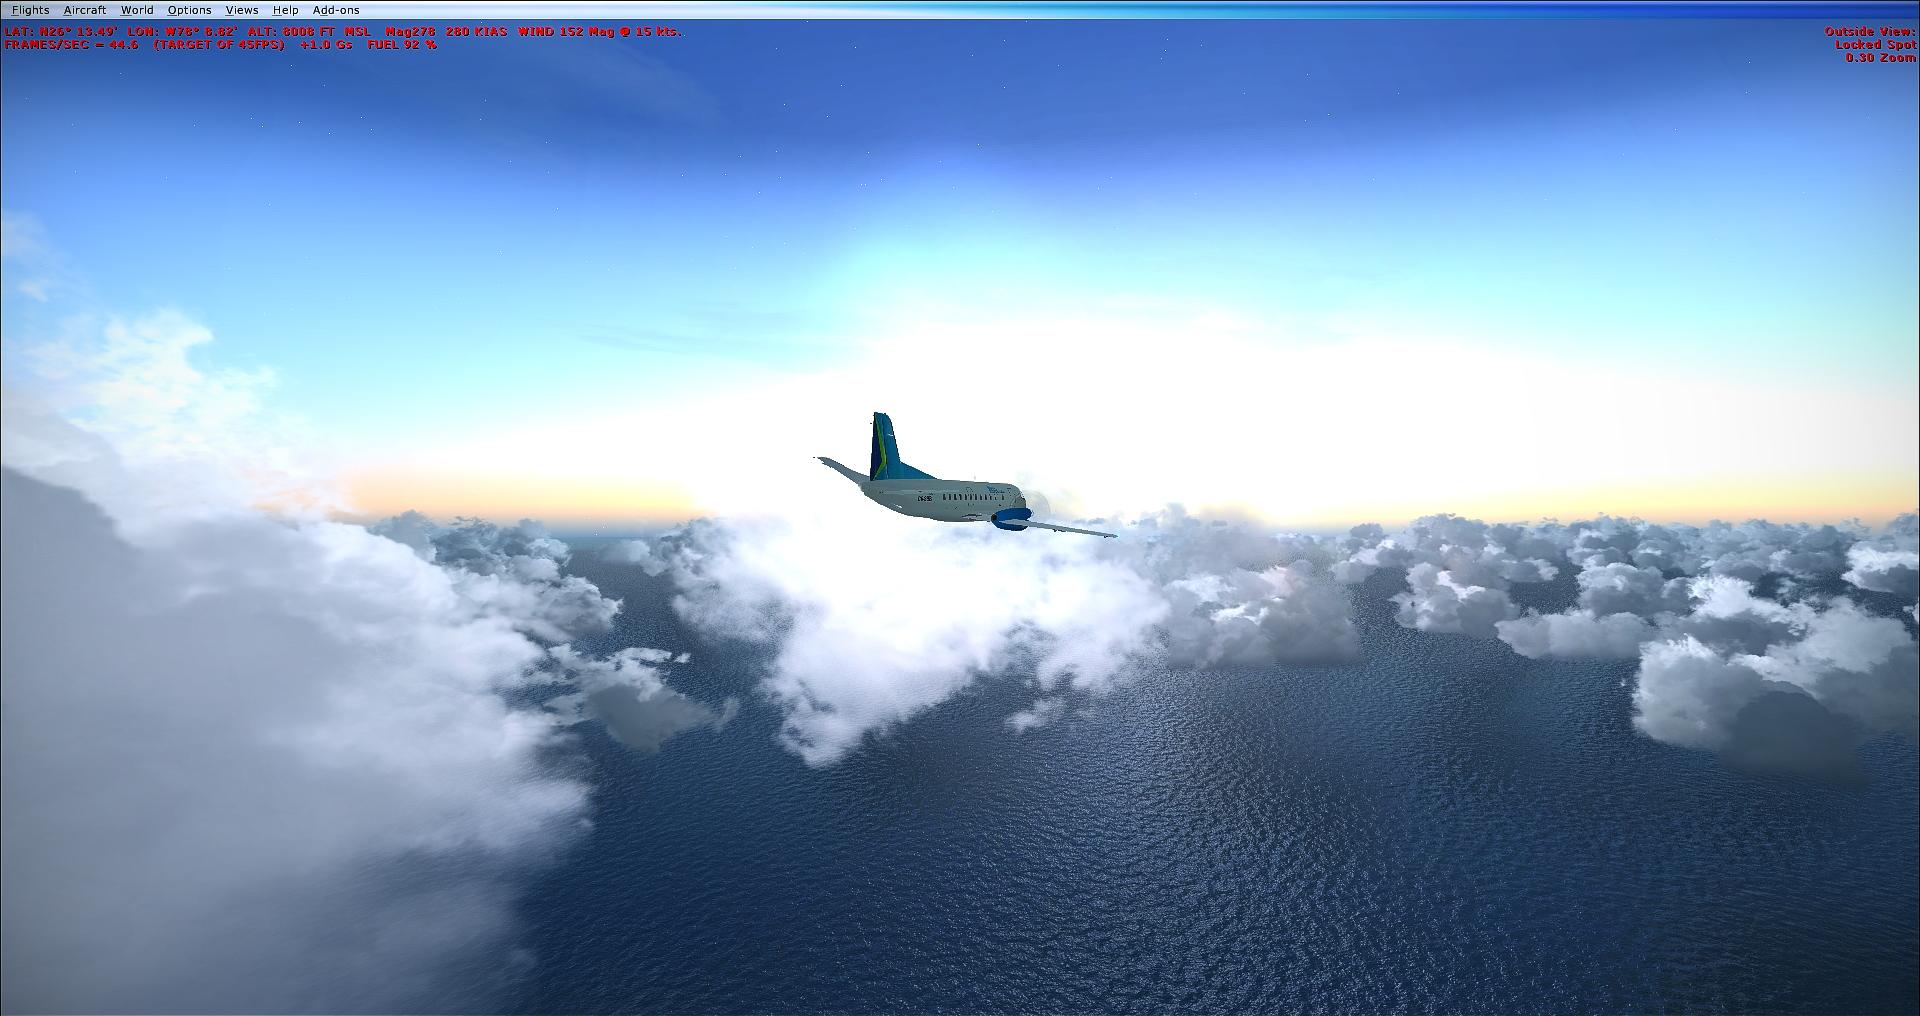 Fsx Rex Texture Direct 4 Saab Over The Ocean